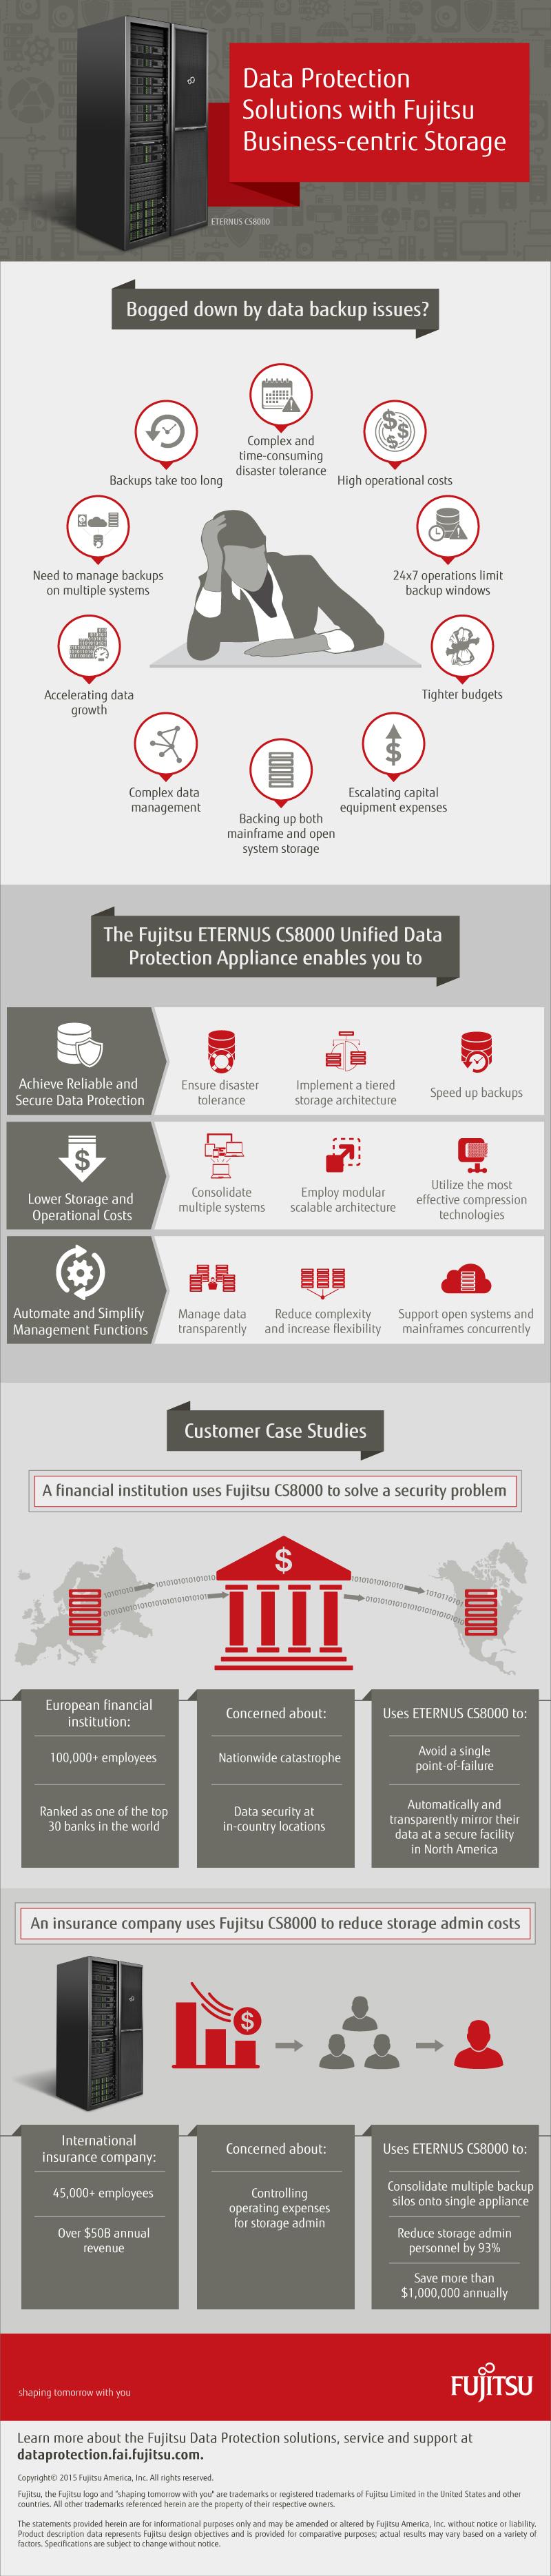 Fujitsu Data Protection